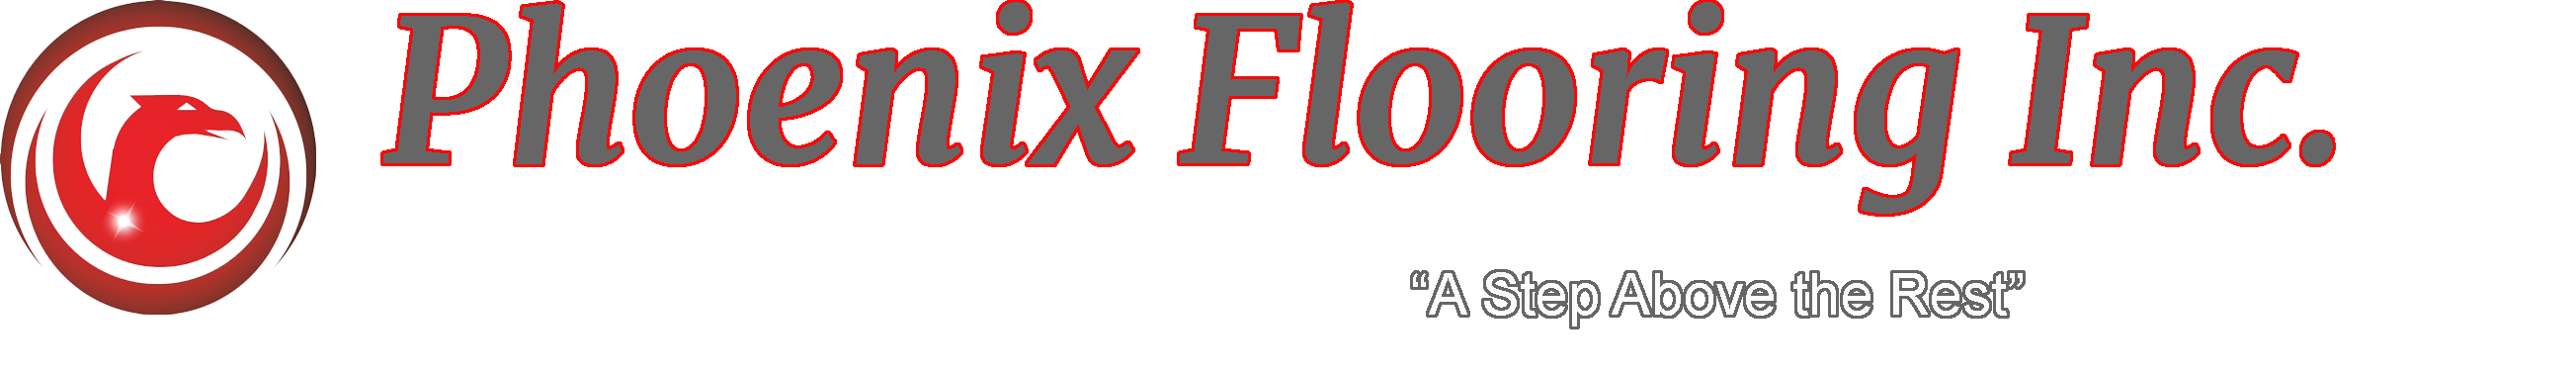 Phoenix Flooring Inc.